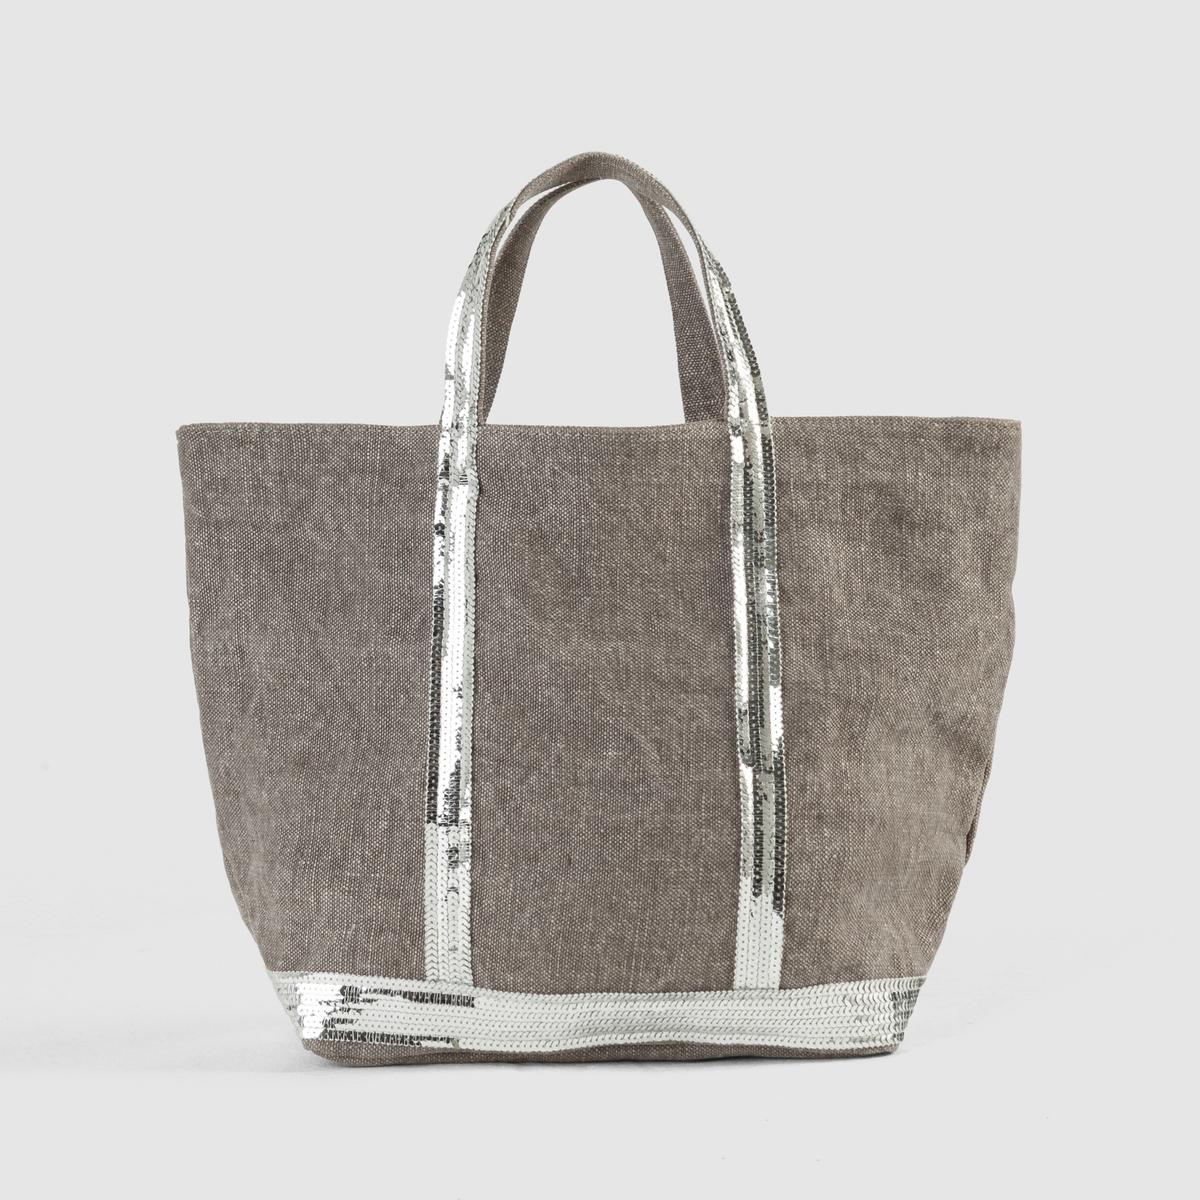 Фото - Сумка-шоппер Cabas сумка viviesta cabas 2015 a4 bolsa b00124